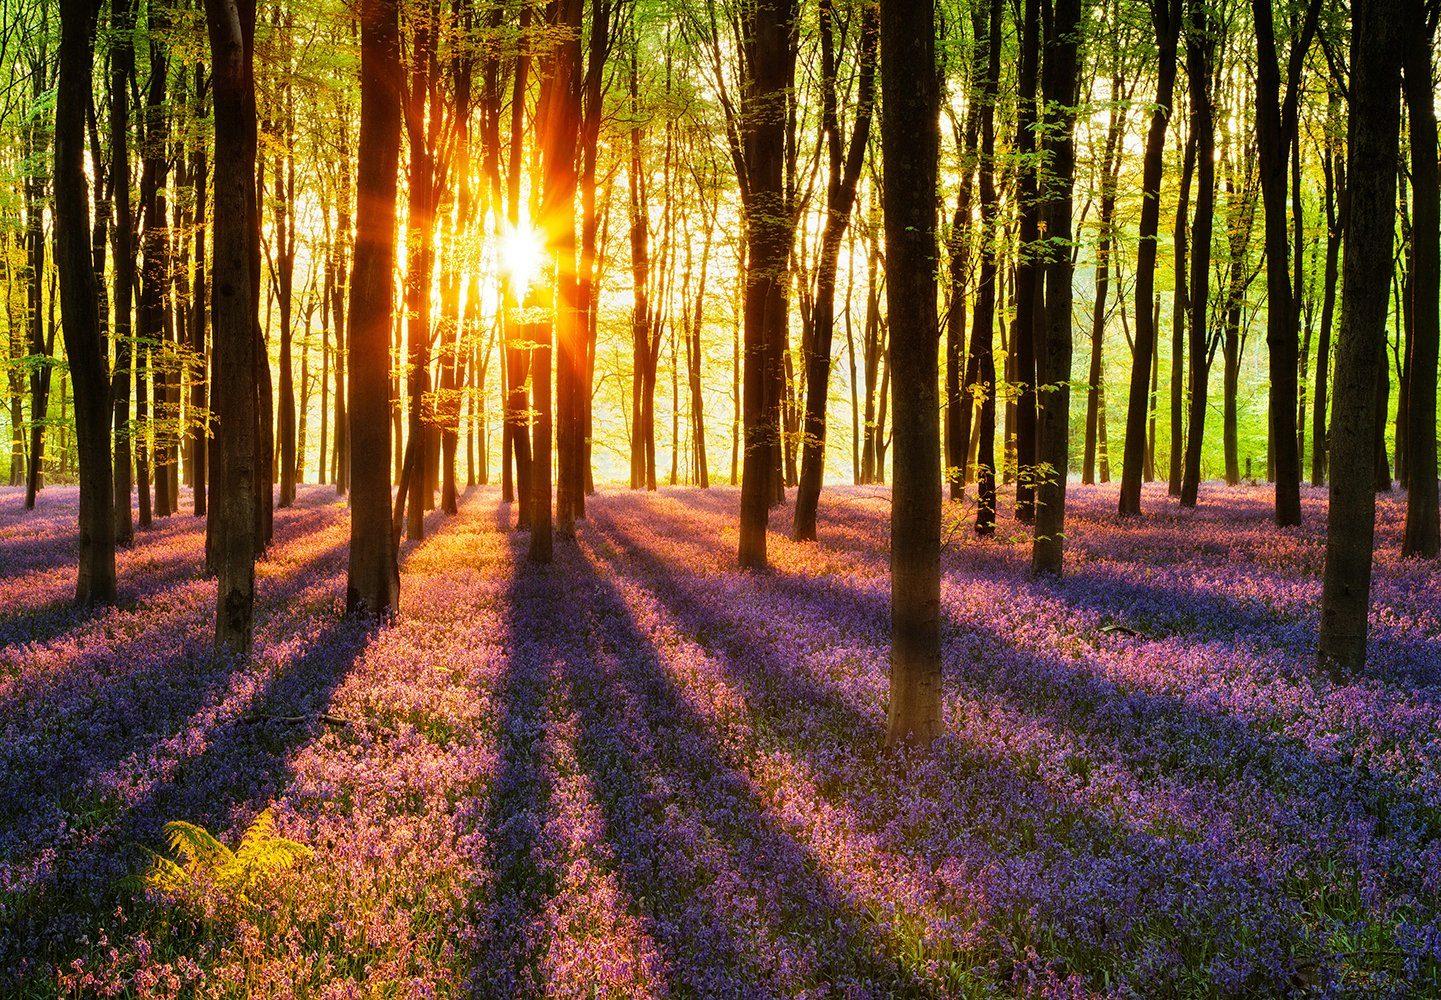 Vliestapete »Woodland at Dawn«, 366x254cm, 8-teilig